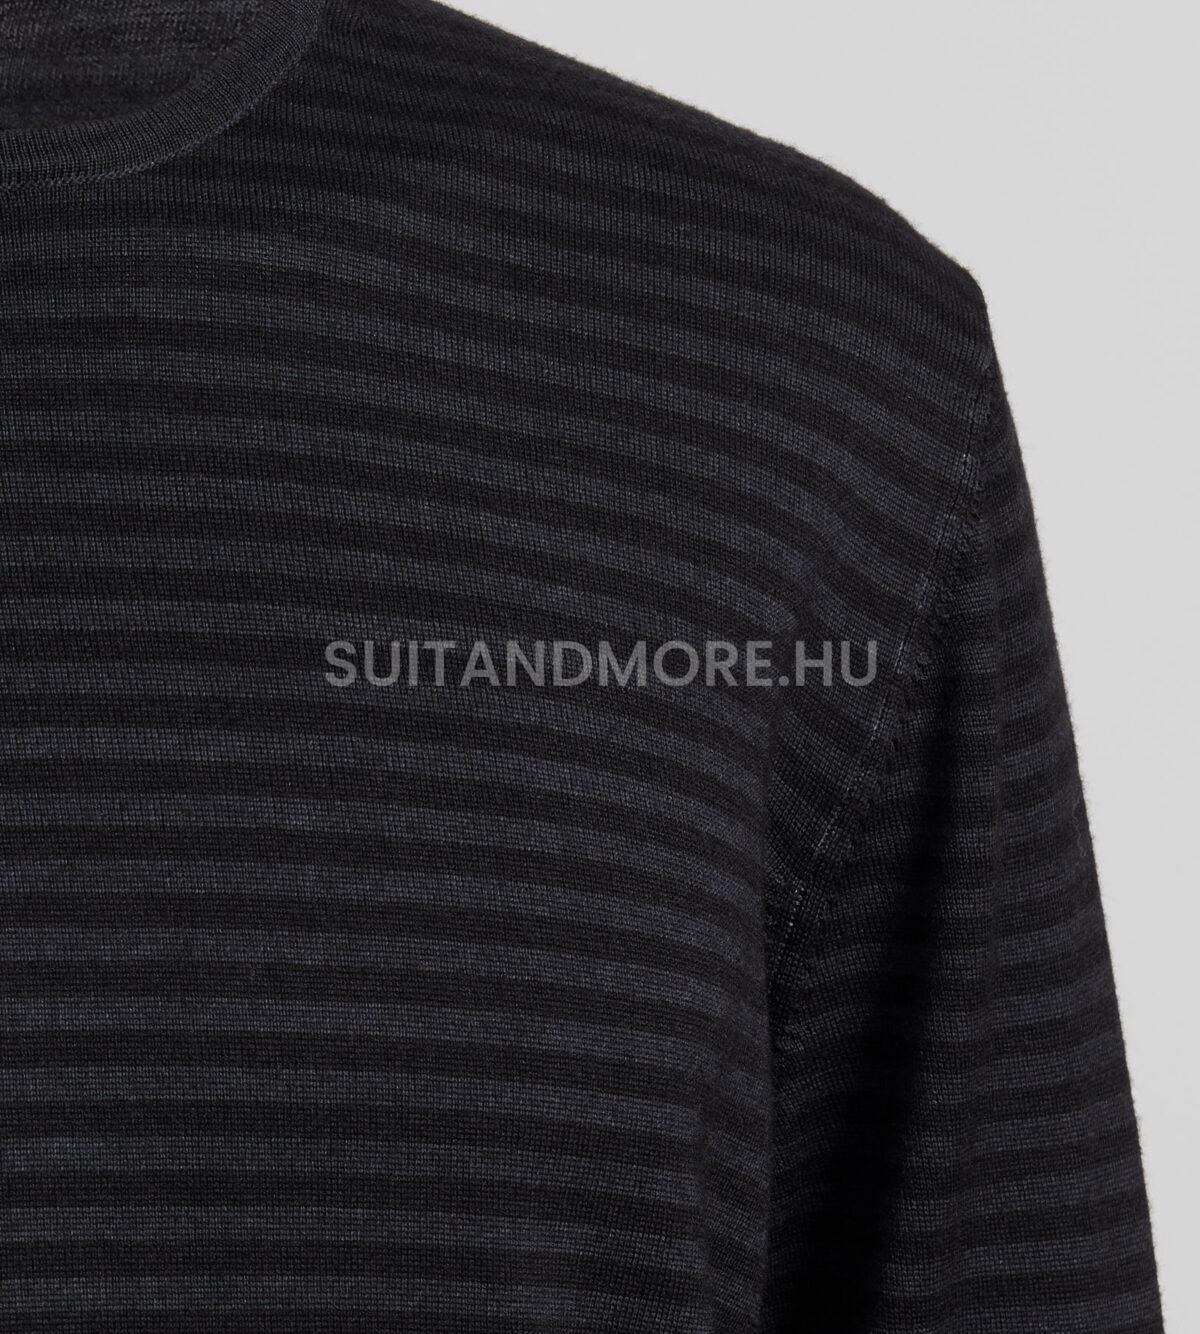 digel-sotetszurke-slim-fit-kerek-nyaku-csikos-gyapju-pulover-asa1-1-1288014-40-02